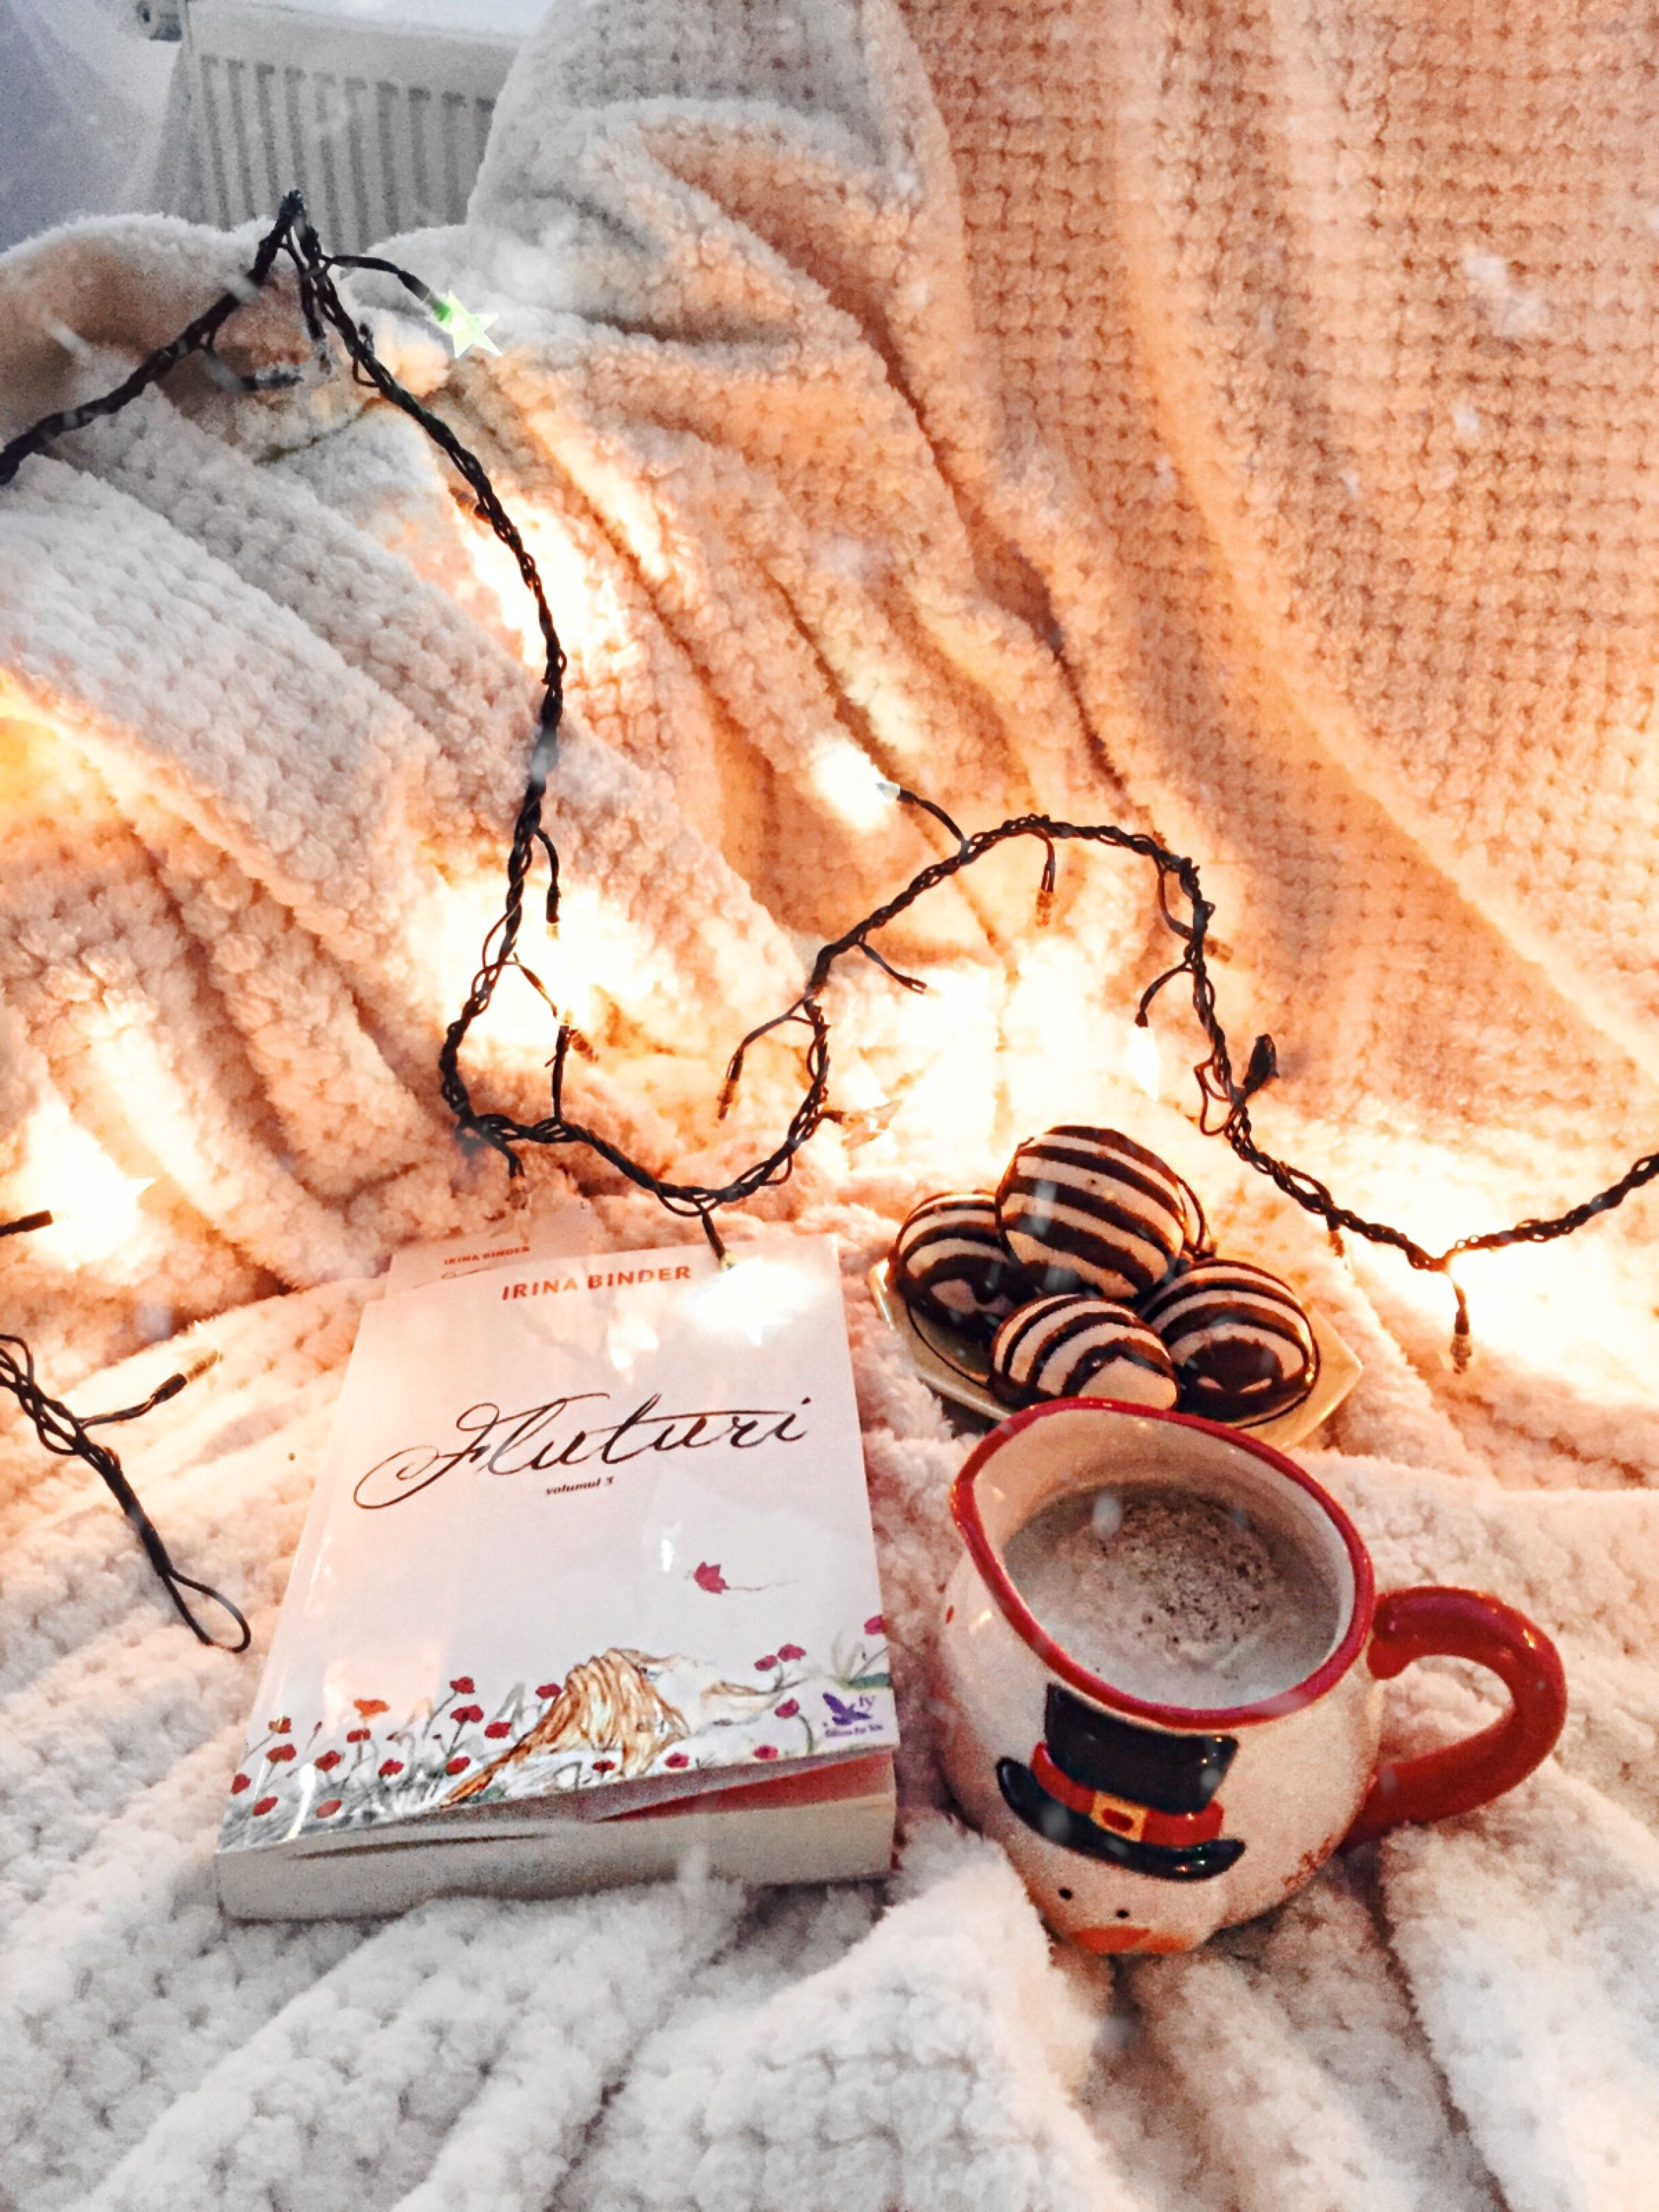 Book Coffee Winter Christmas Gifts Winter Christmas Fashion Christmas Gifts